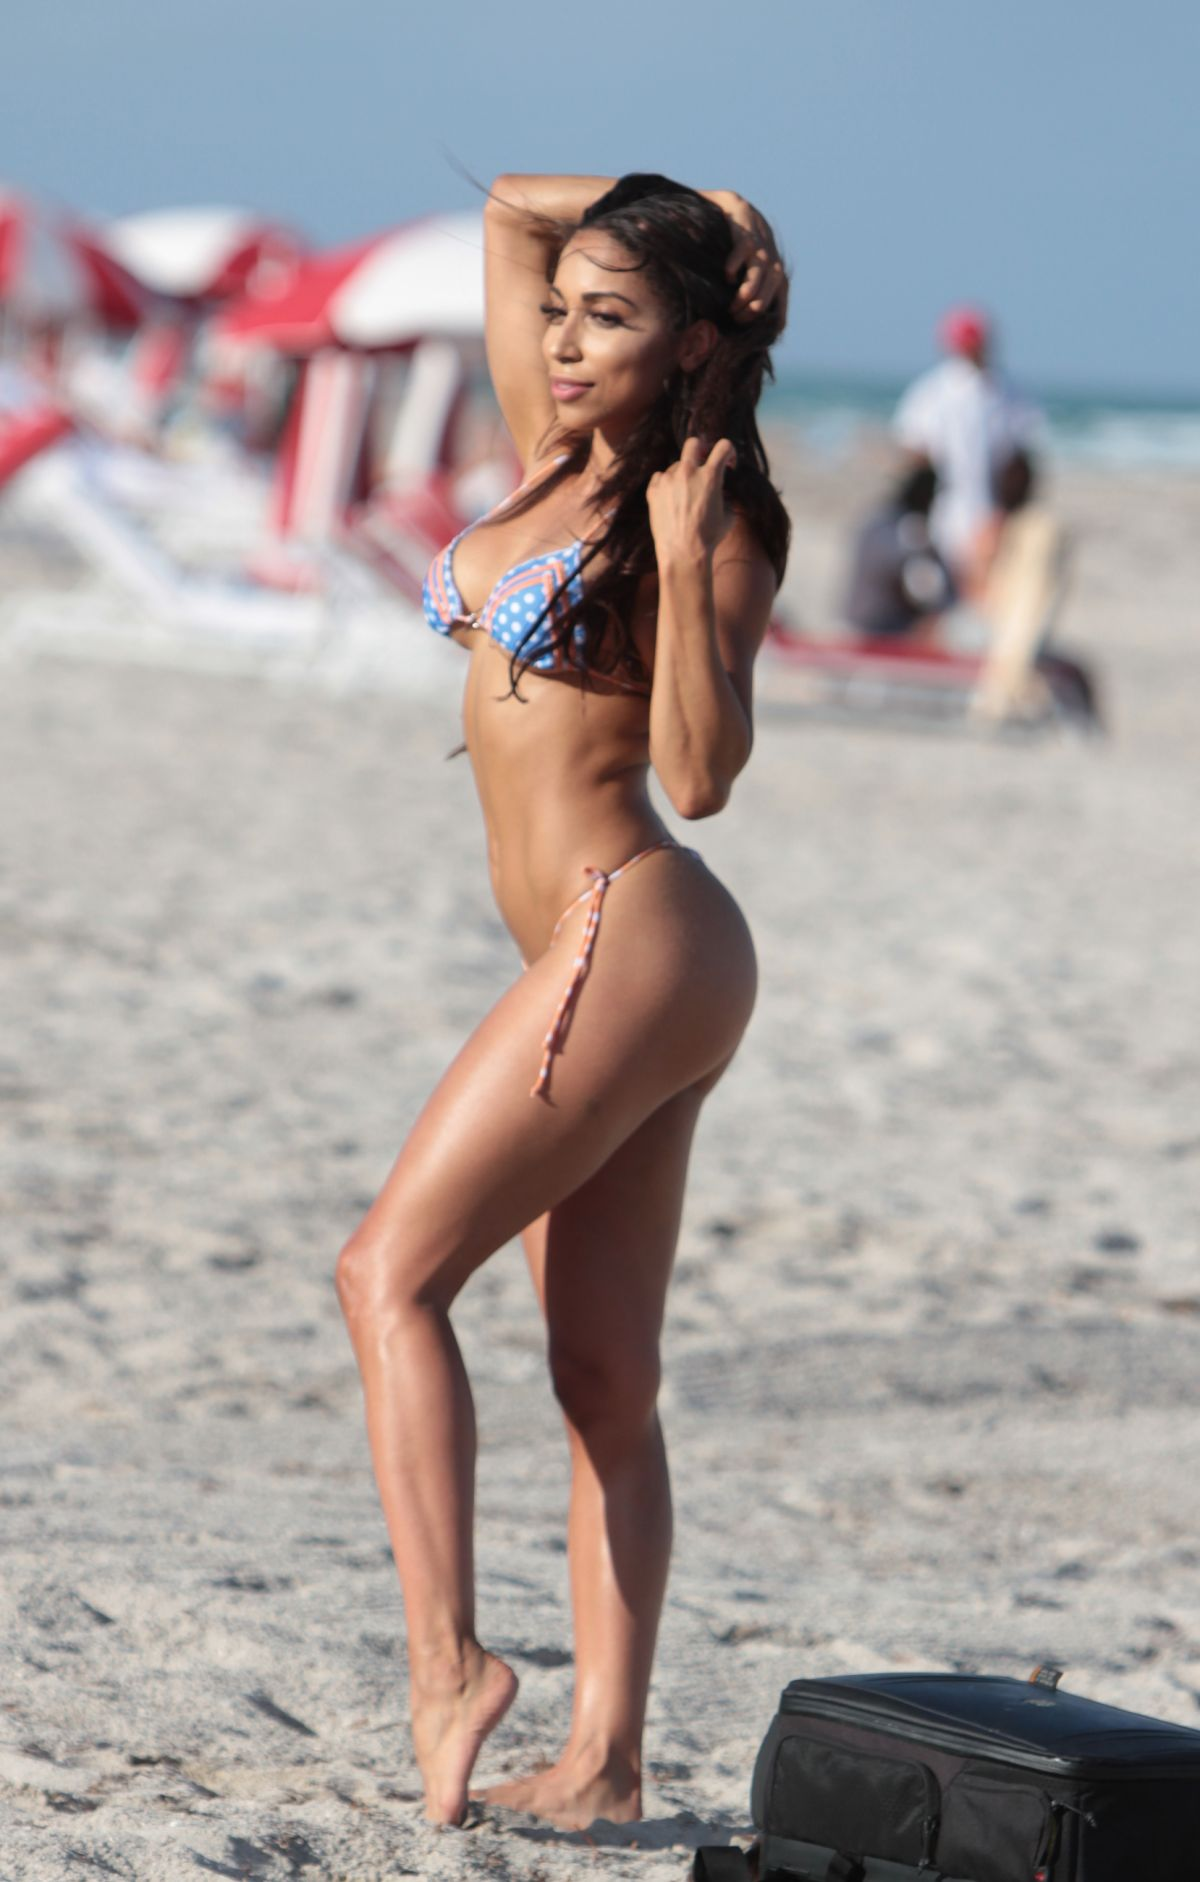 2019 Sophia Leger Valere naked (96 photos), Ass, Bikini, Feet, butt 2020